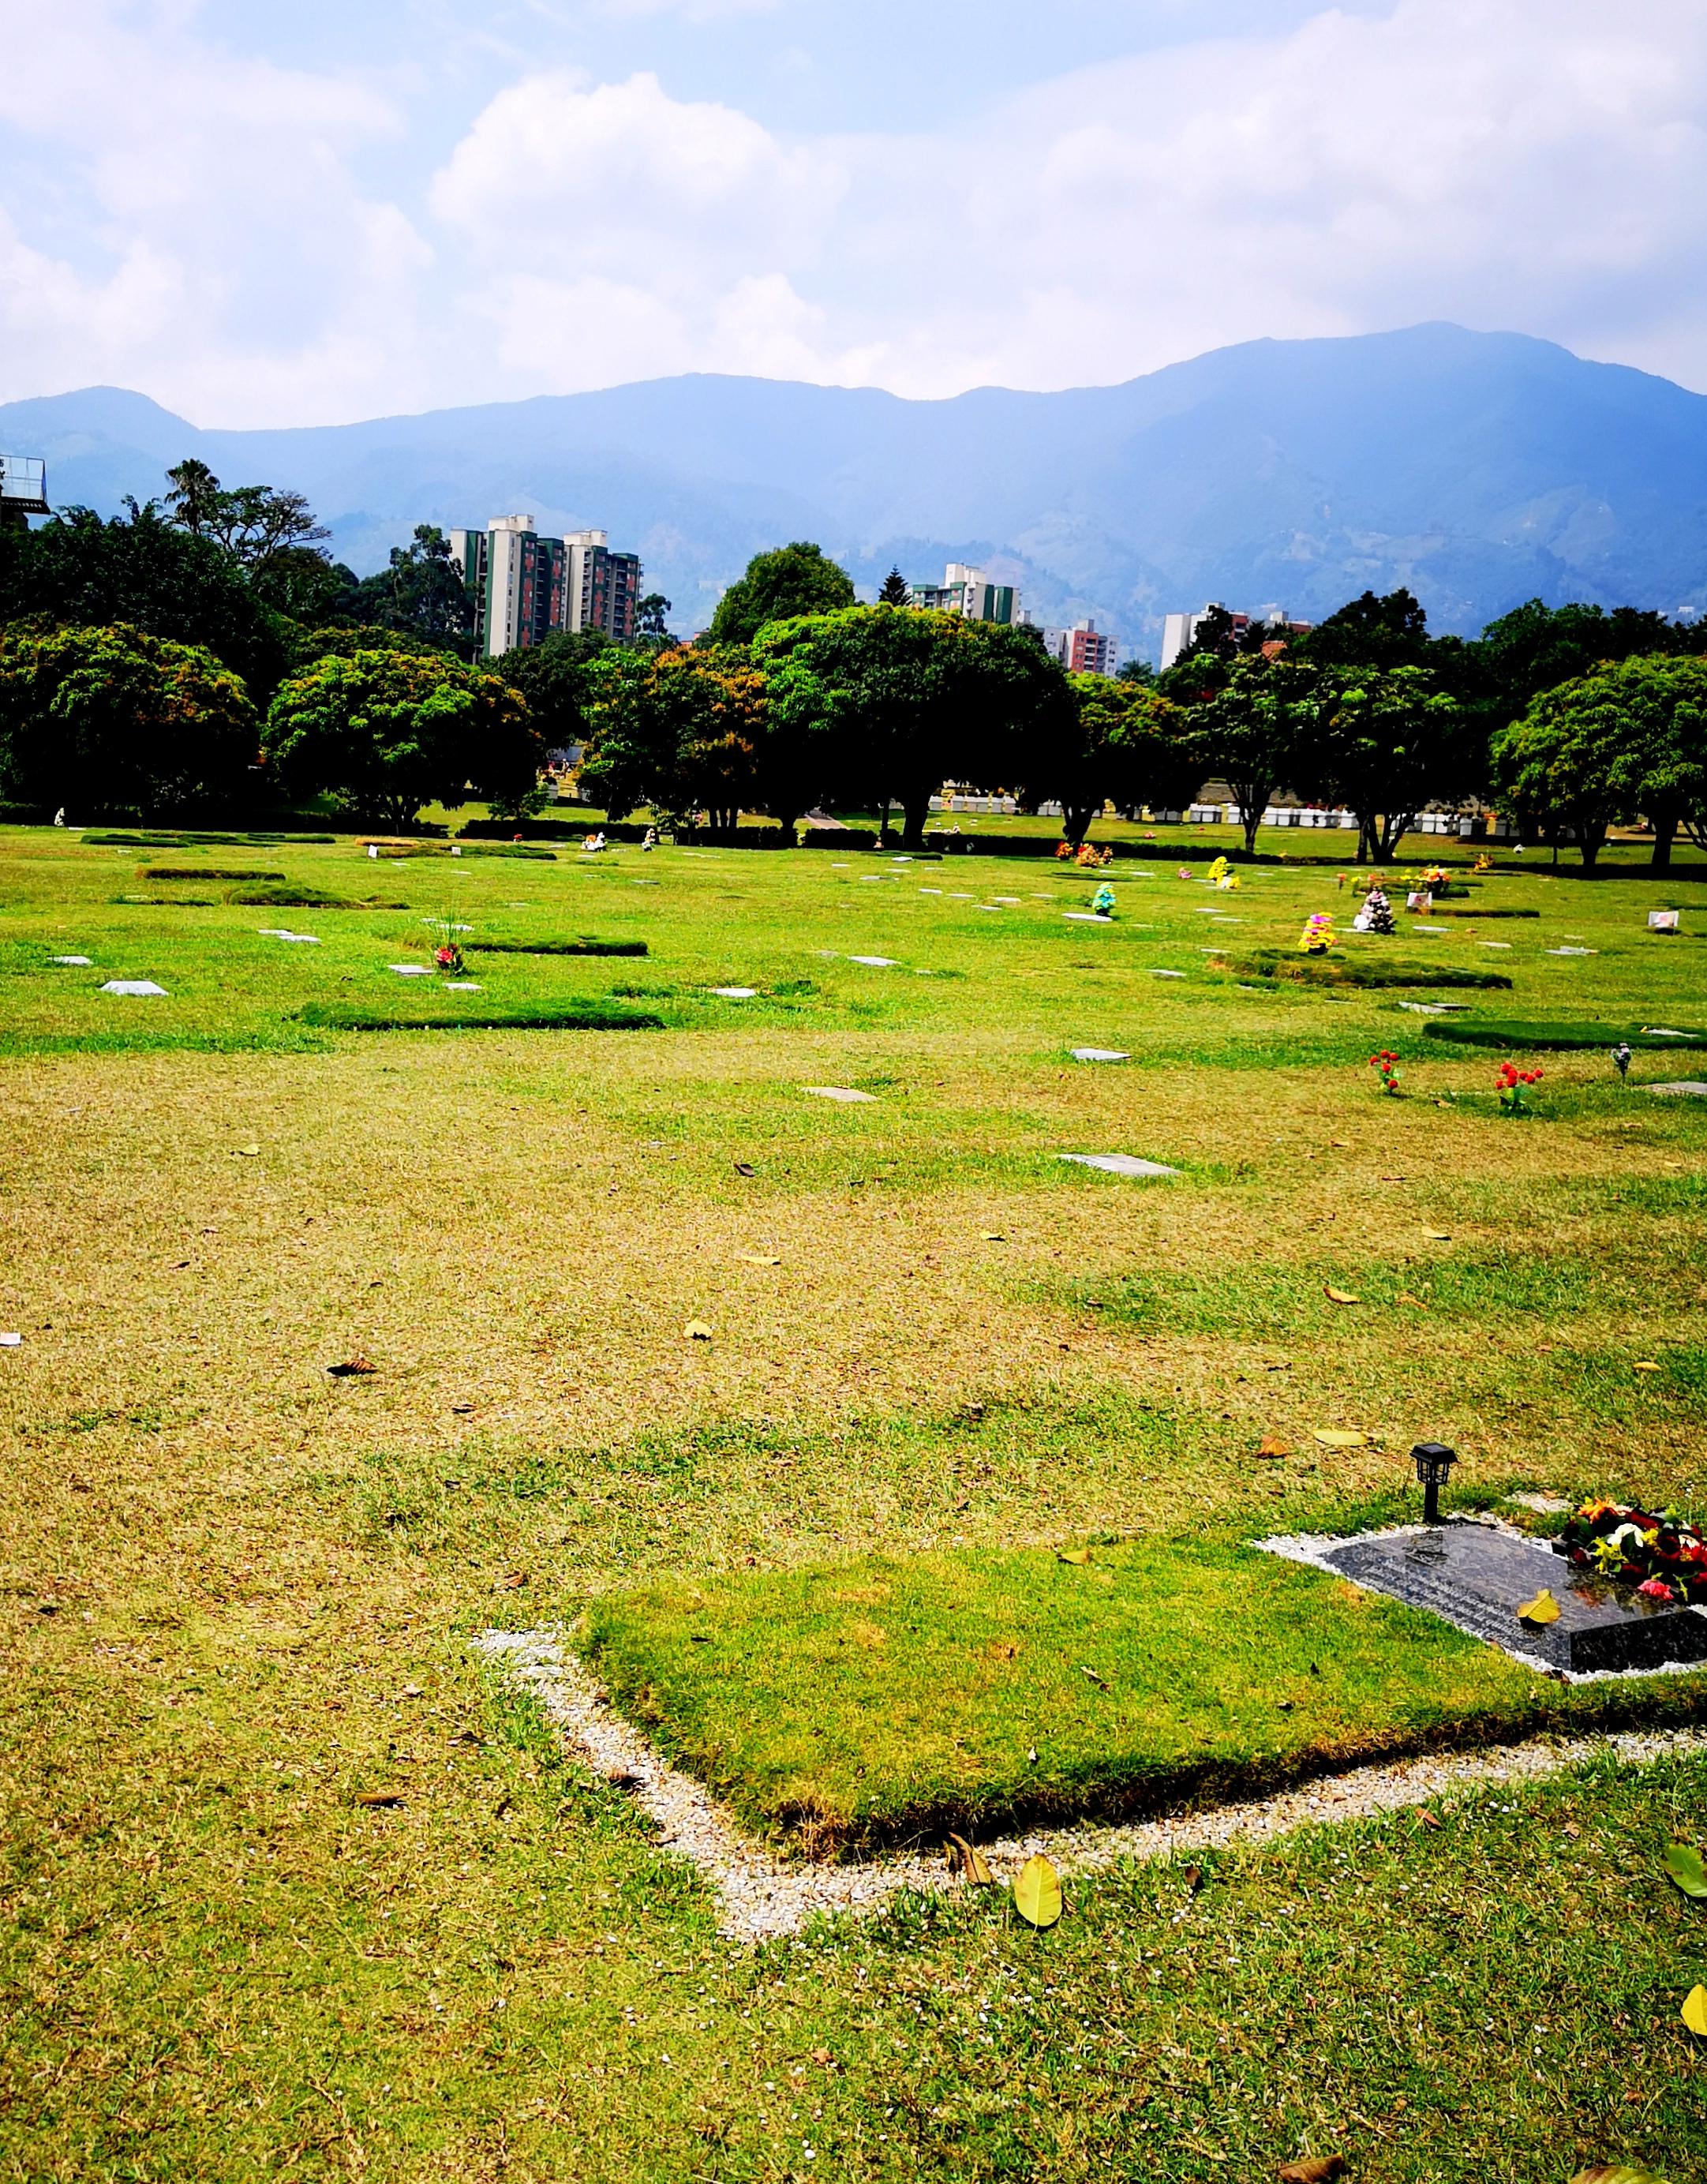 Cemetario Jardins Montesacro gdzie znajduje się grób Pabla Escobar